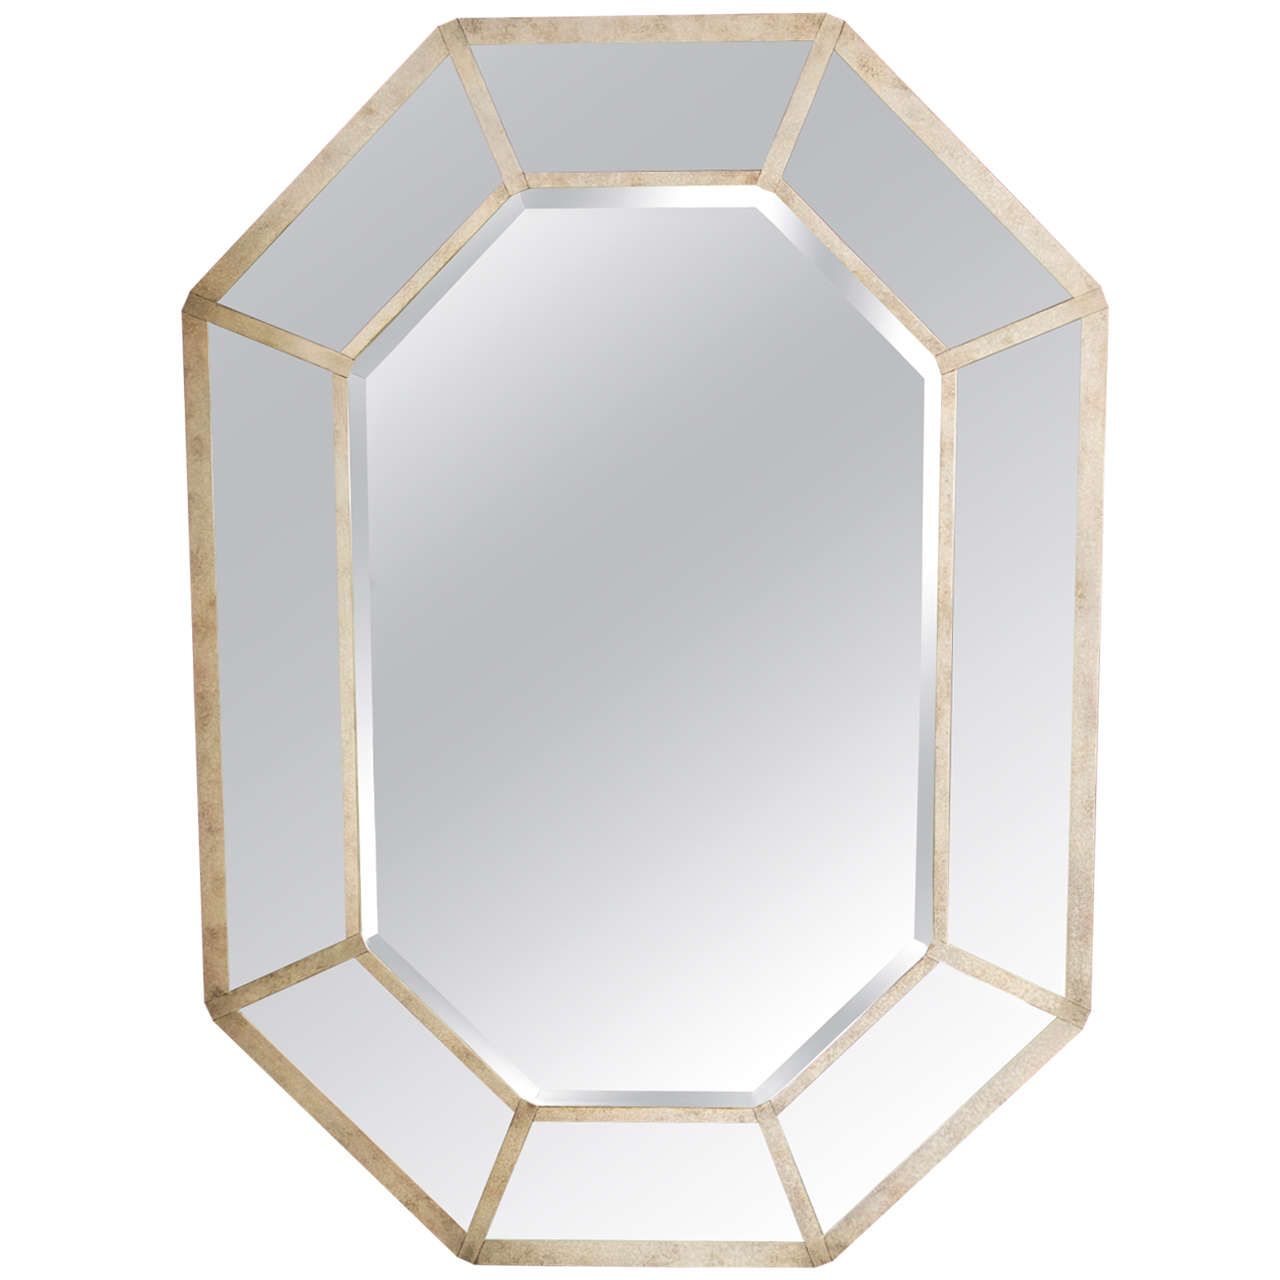 Karl springer octagonal mirror with beveled glass panels for Octagon beveled mirror